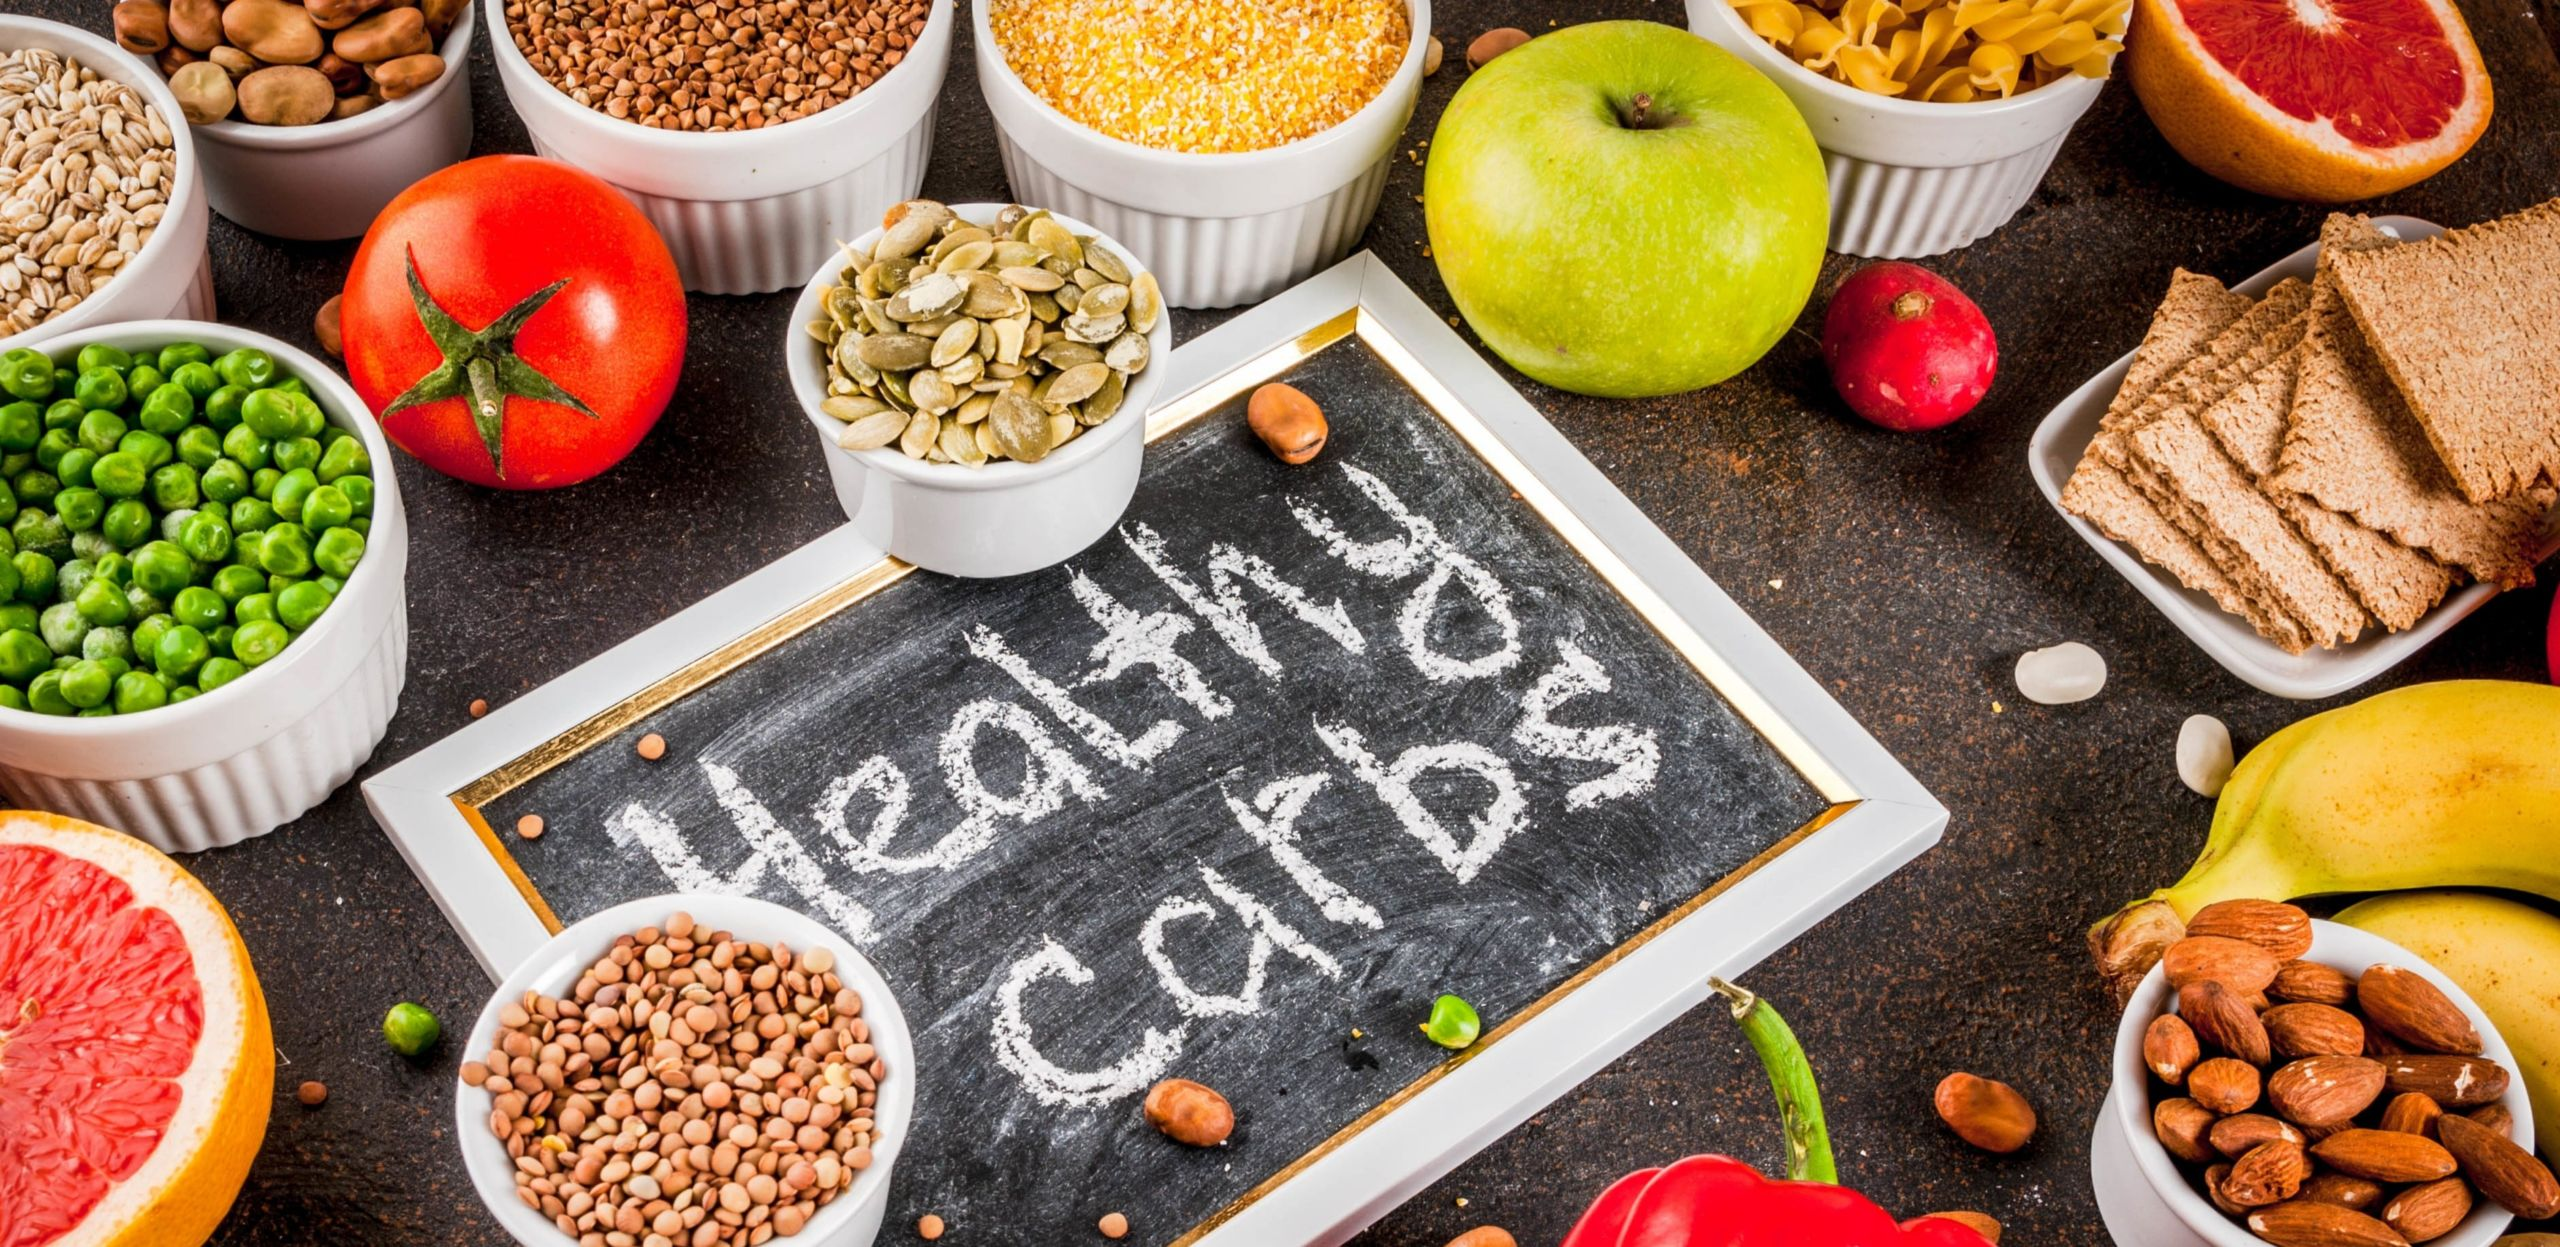 Flessibilità metabolica per bruciare i carboidrati